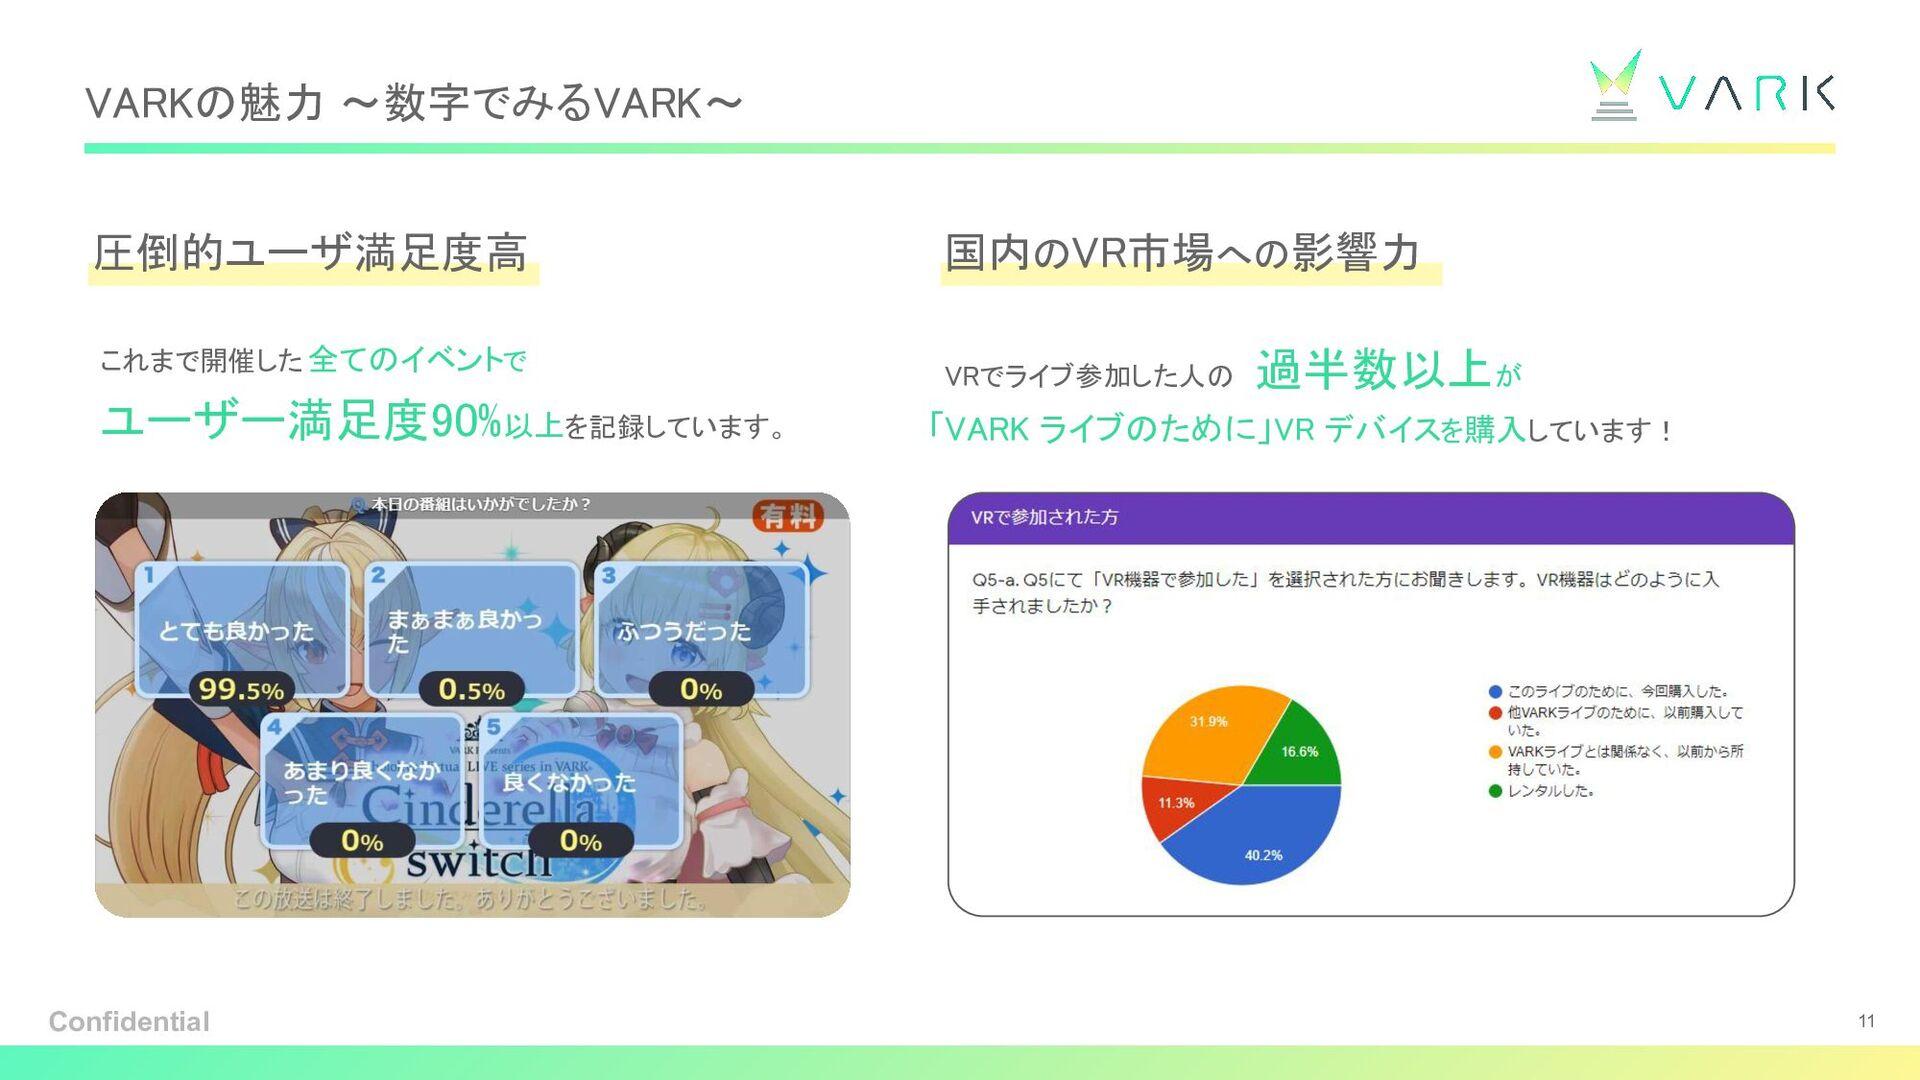 VARKの魅力 「バーチャルライブプラットフォーム」としての 3 つの強味 VARK が 2 ...